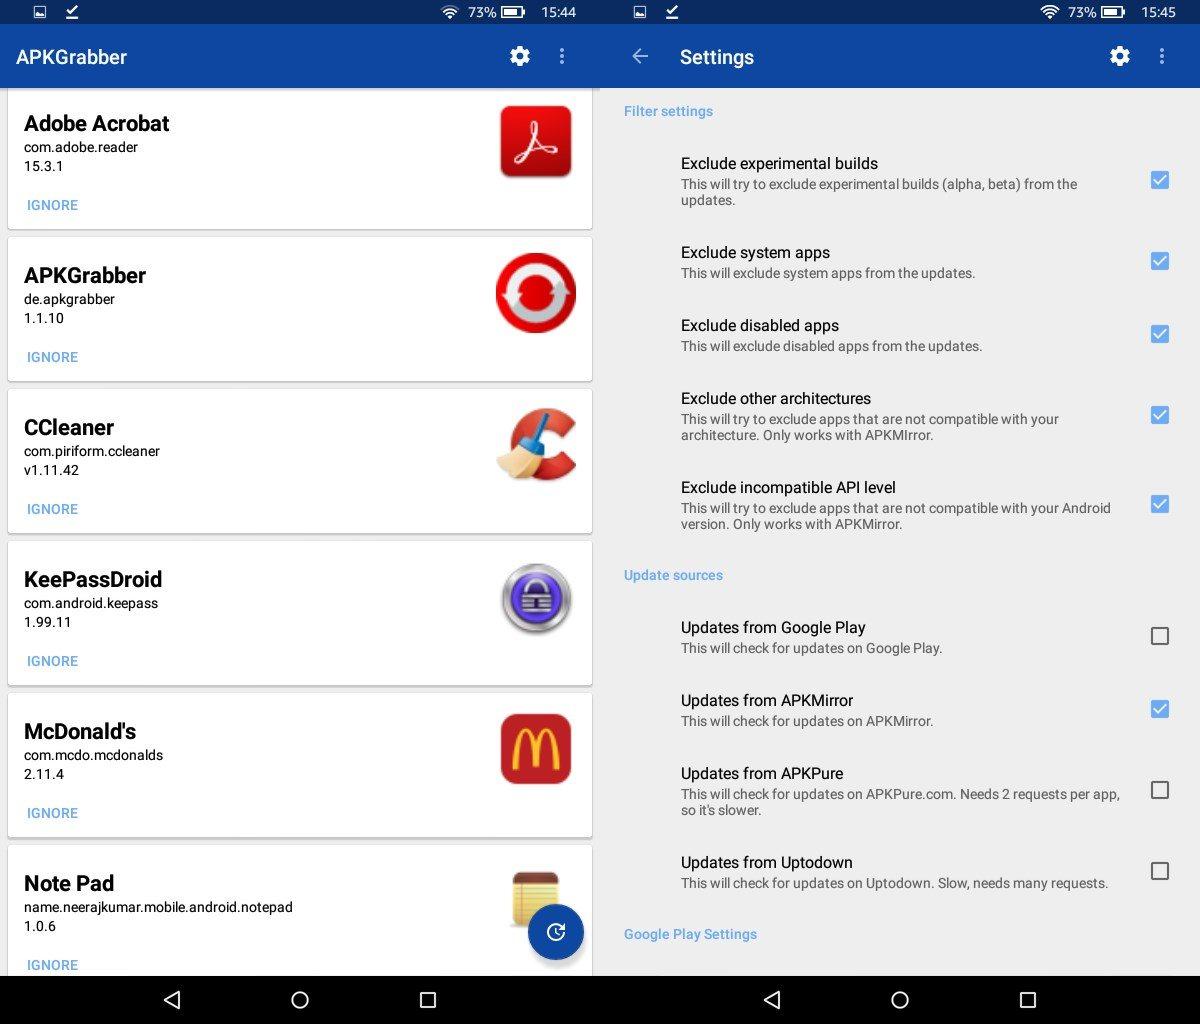 ¡Android en peligro! Revisa si no has descargado este peligroso navegador